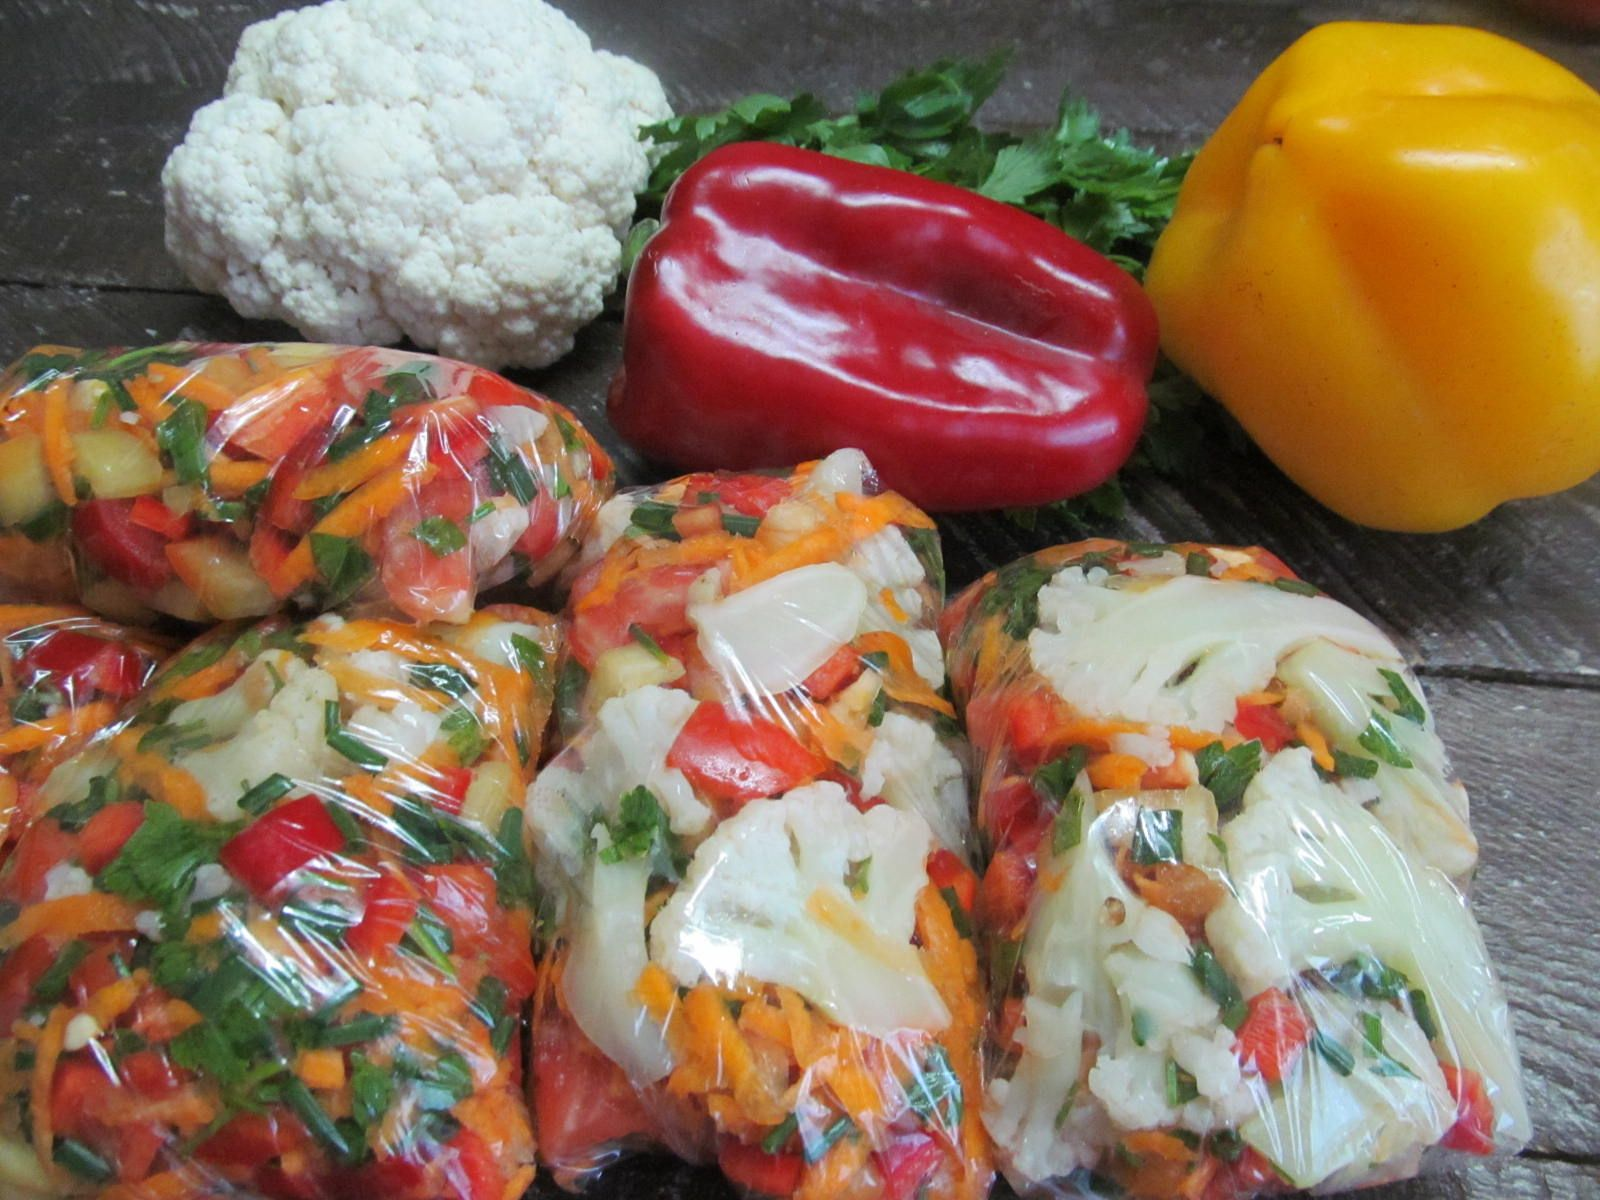 заморозить овощи на зиму рецепты с фото этих